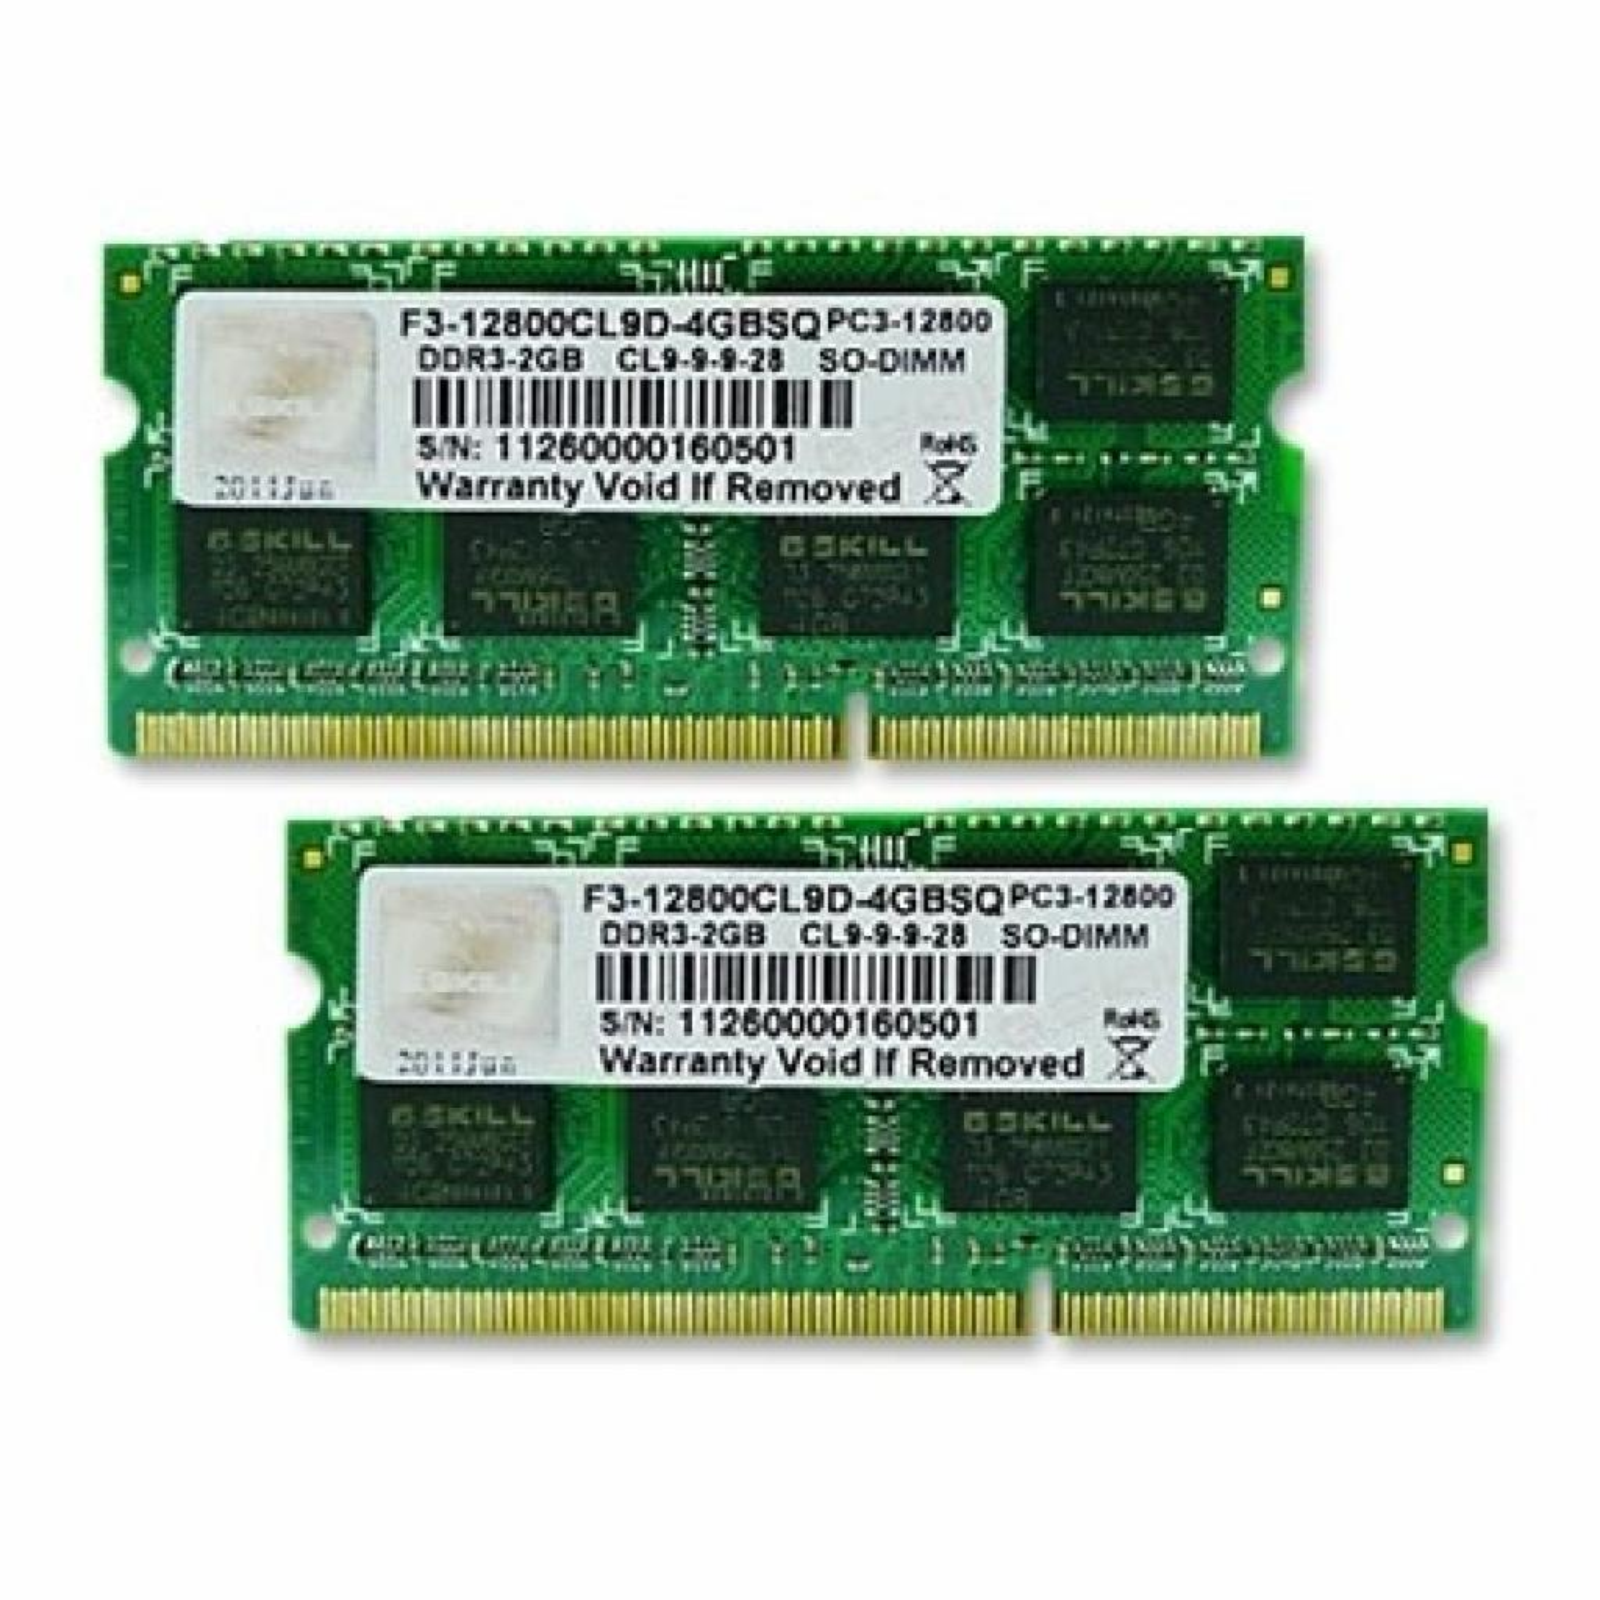 Модуль памяти для ноутбука SoDIMM DDR3 8GB (2x4GB) 1600 MHz G.Skill (F3-12800CL9D-8GBSQ)